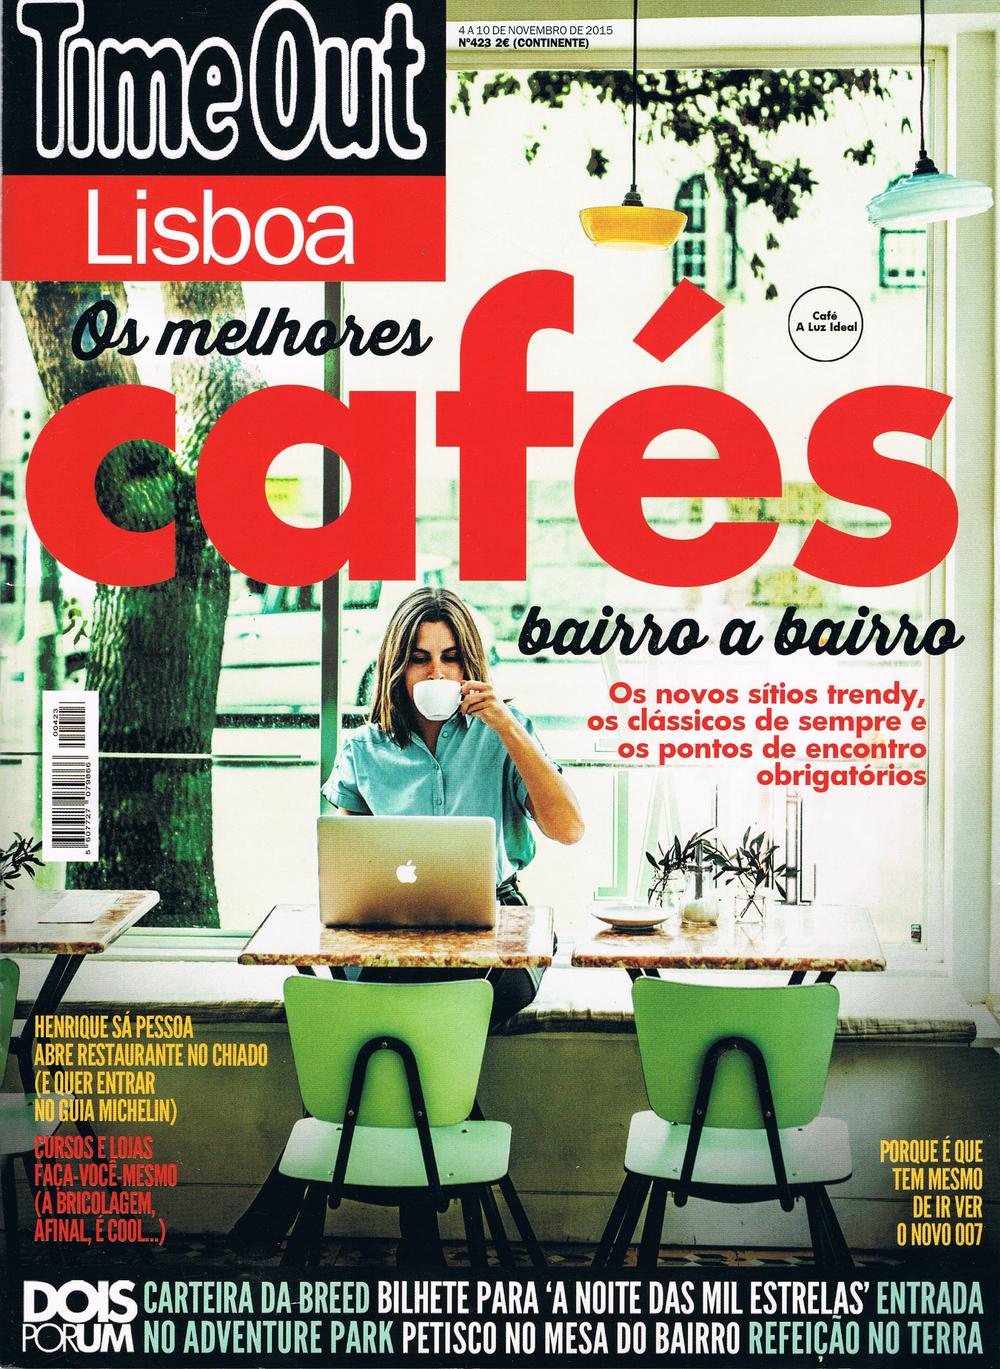 TimeOut nº423 | 4-10 Novembro 2015 — capa